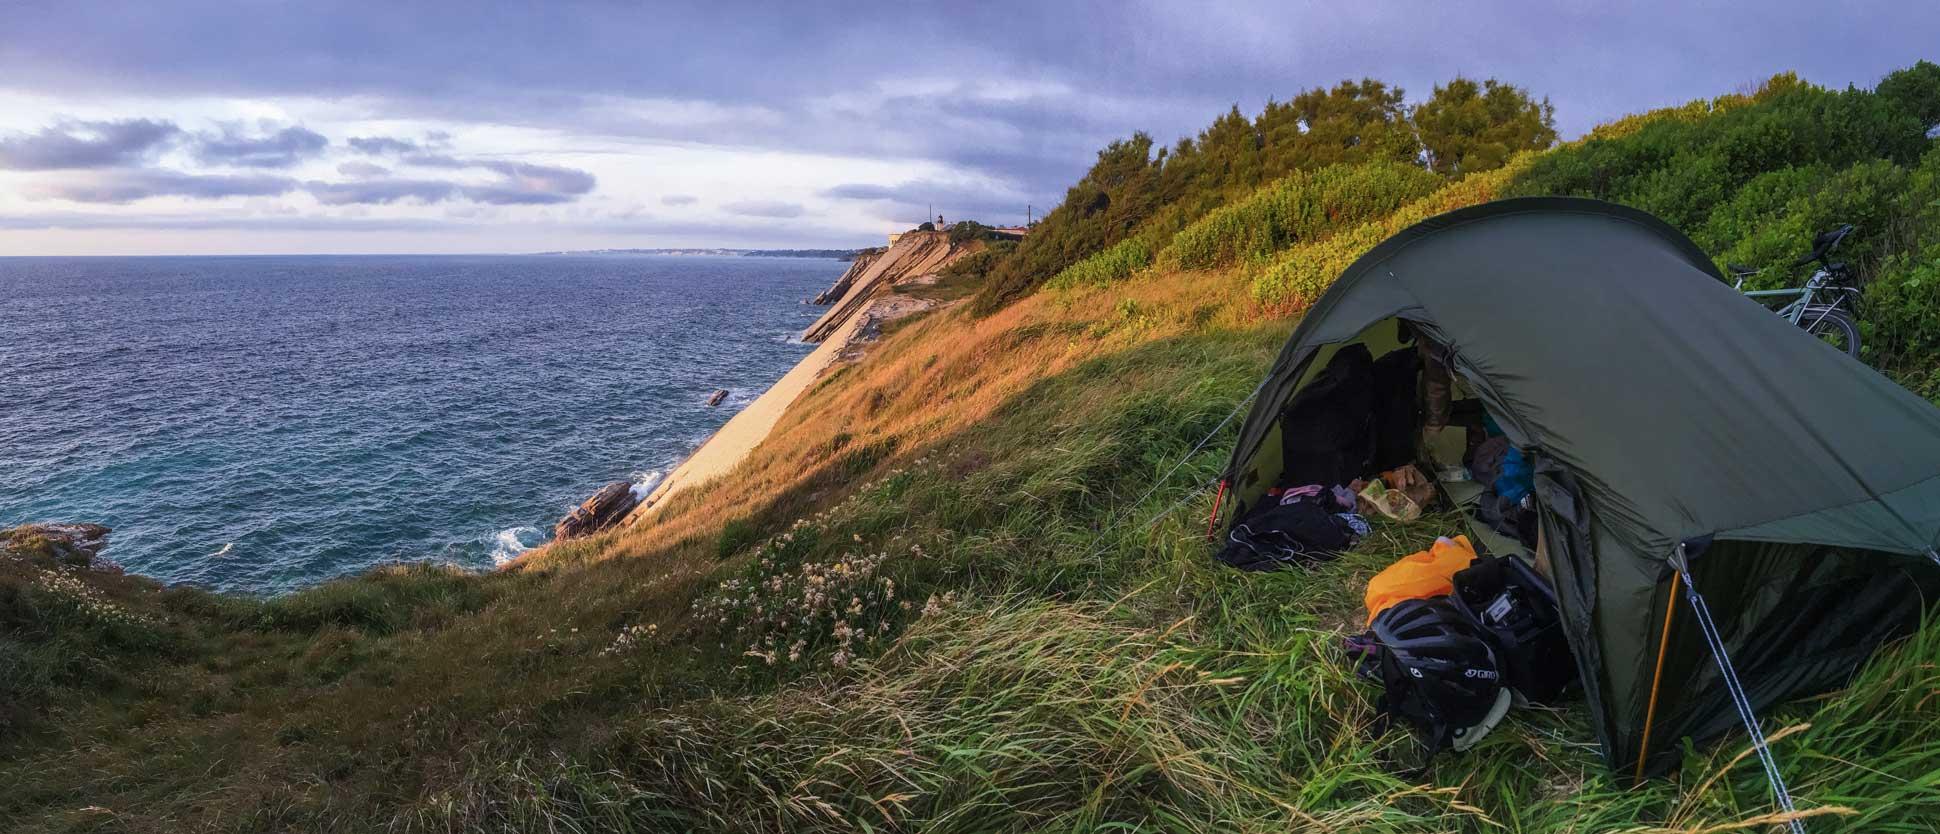 Silja Minkkinen Camping Views